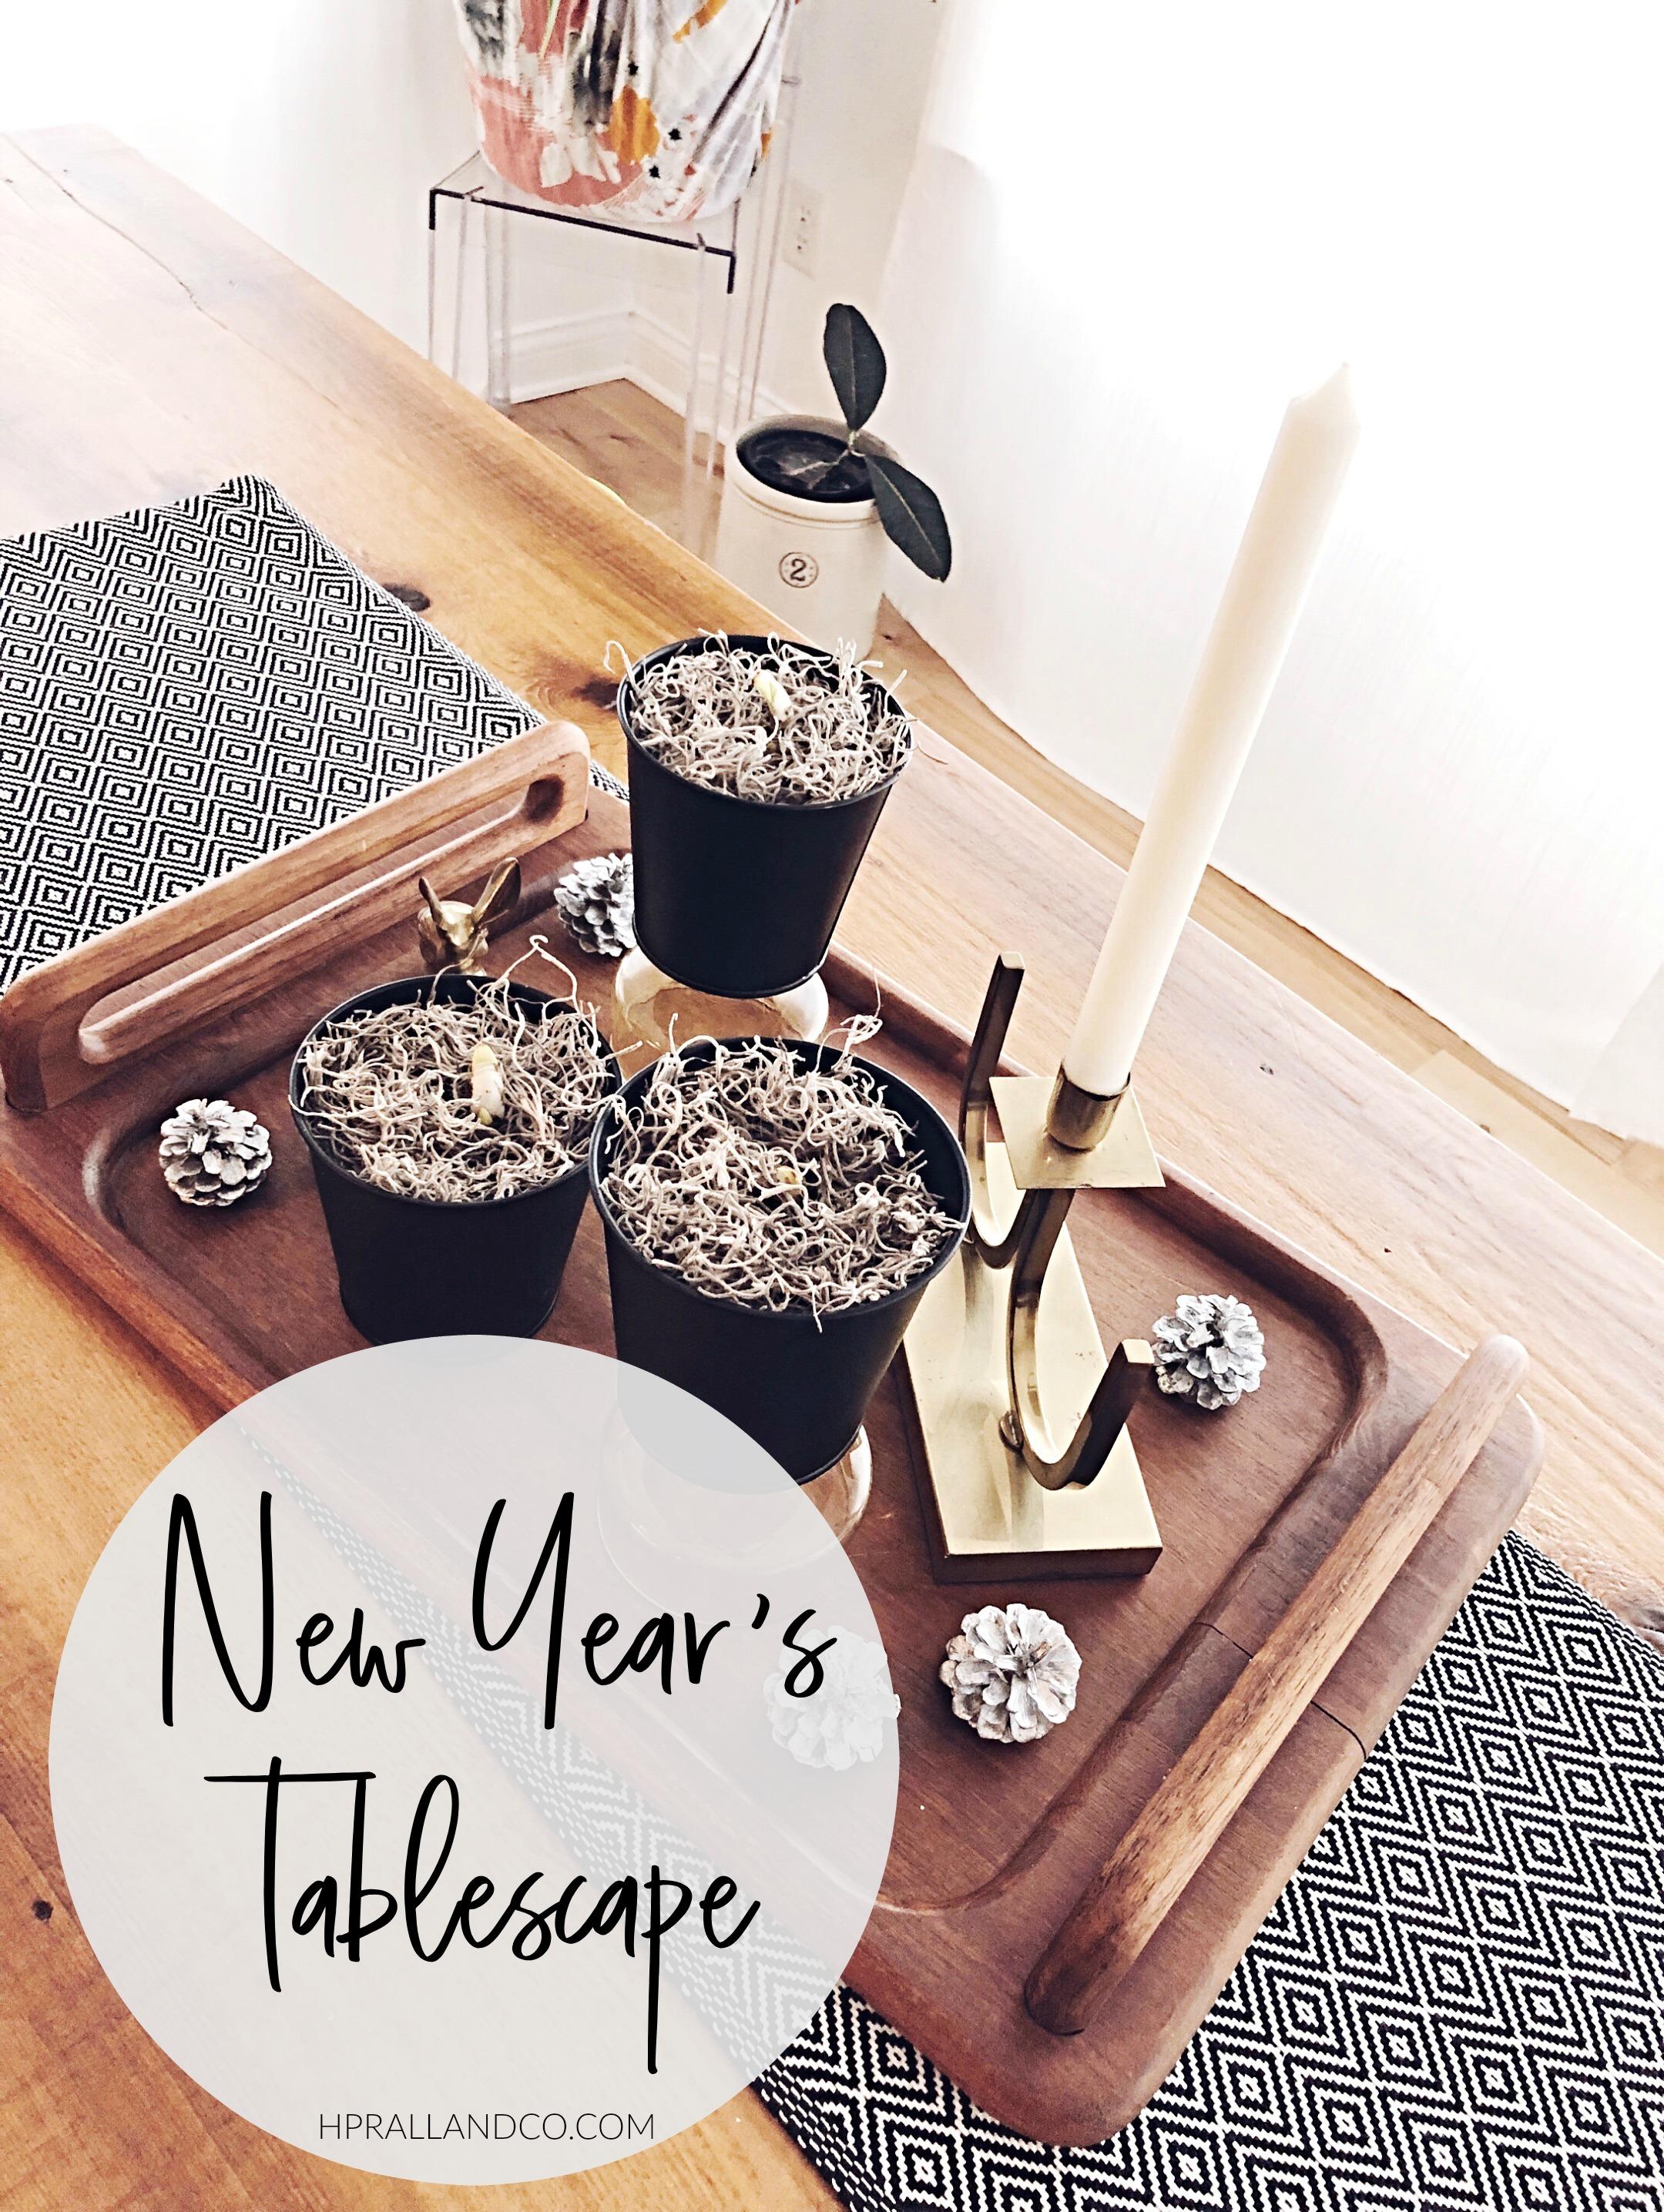 New Year's Tablescape   hprallandco.com   H.Prall & Co. Interior Decorating